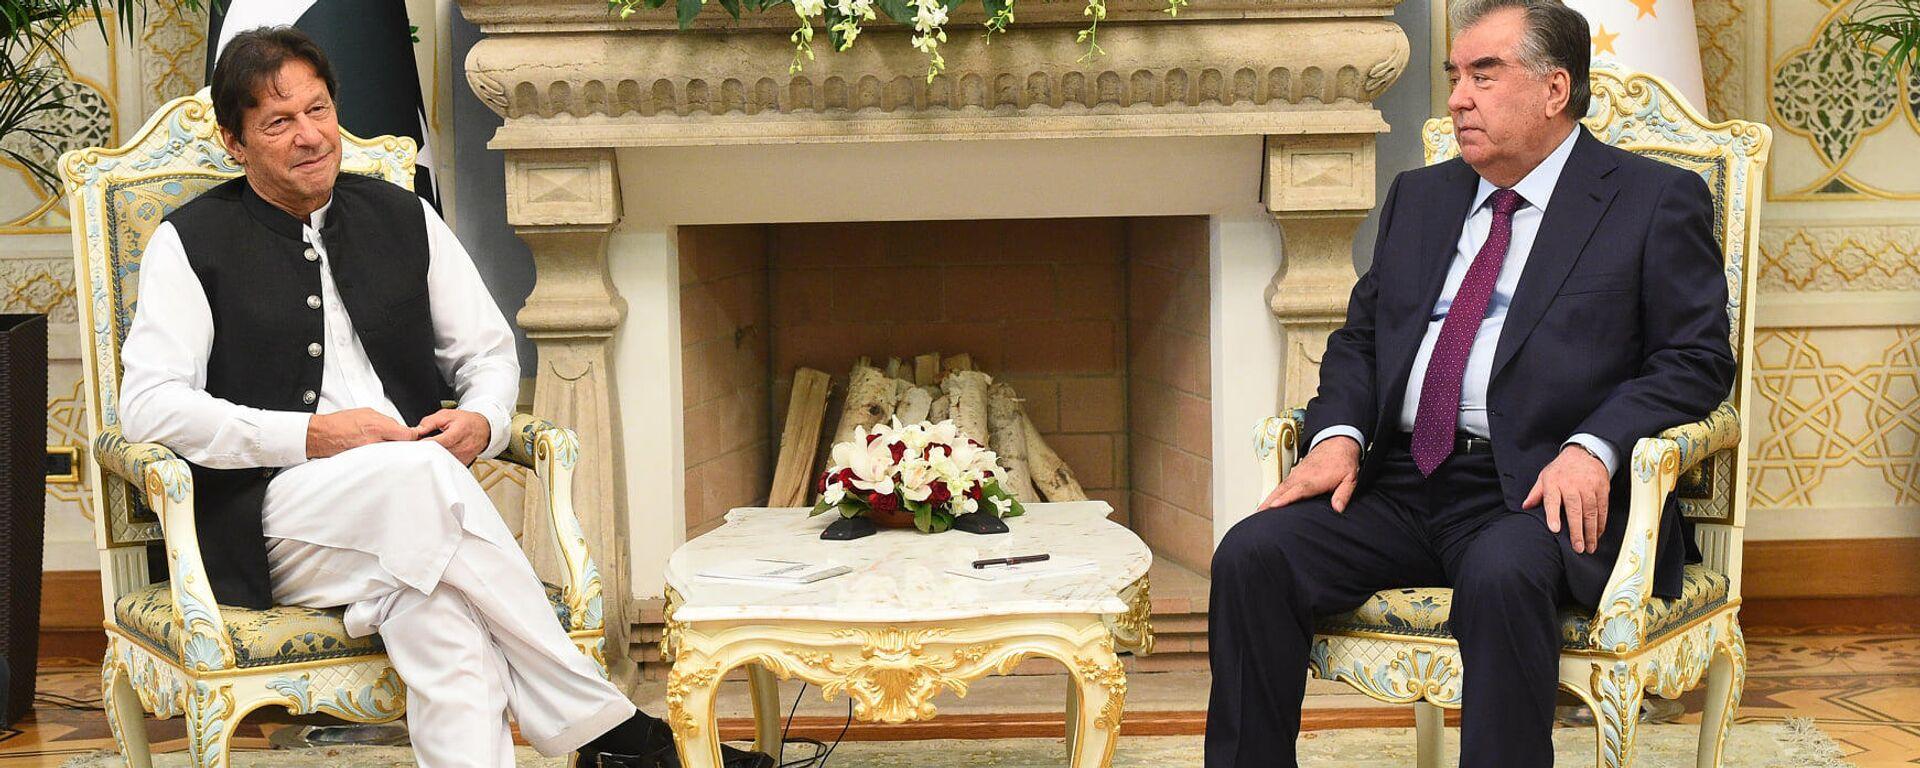 Эмомали Рахмон, президент РТ и Имран Хан Премьер-министр Пакистана  - Sputnik Тоҷикистон, 1920, 18.09.2021